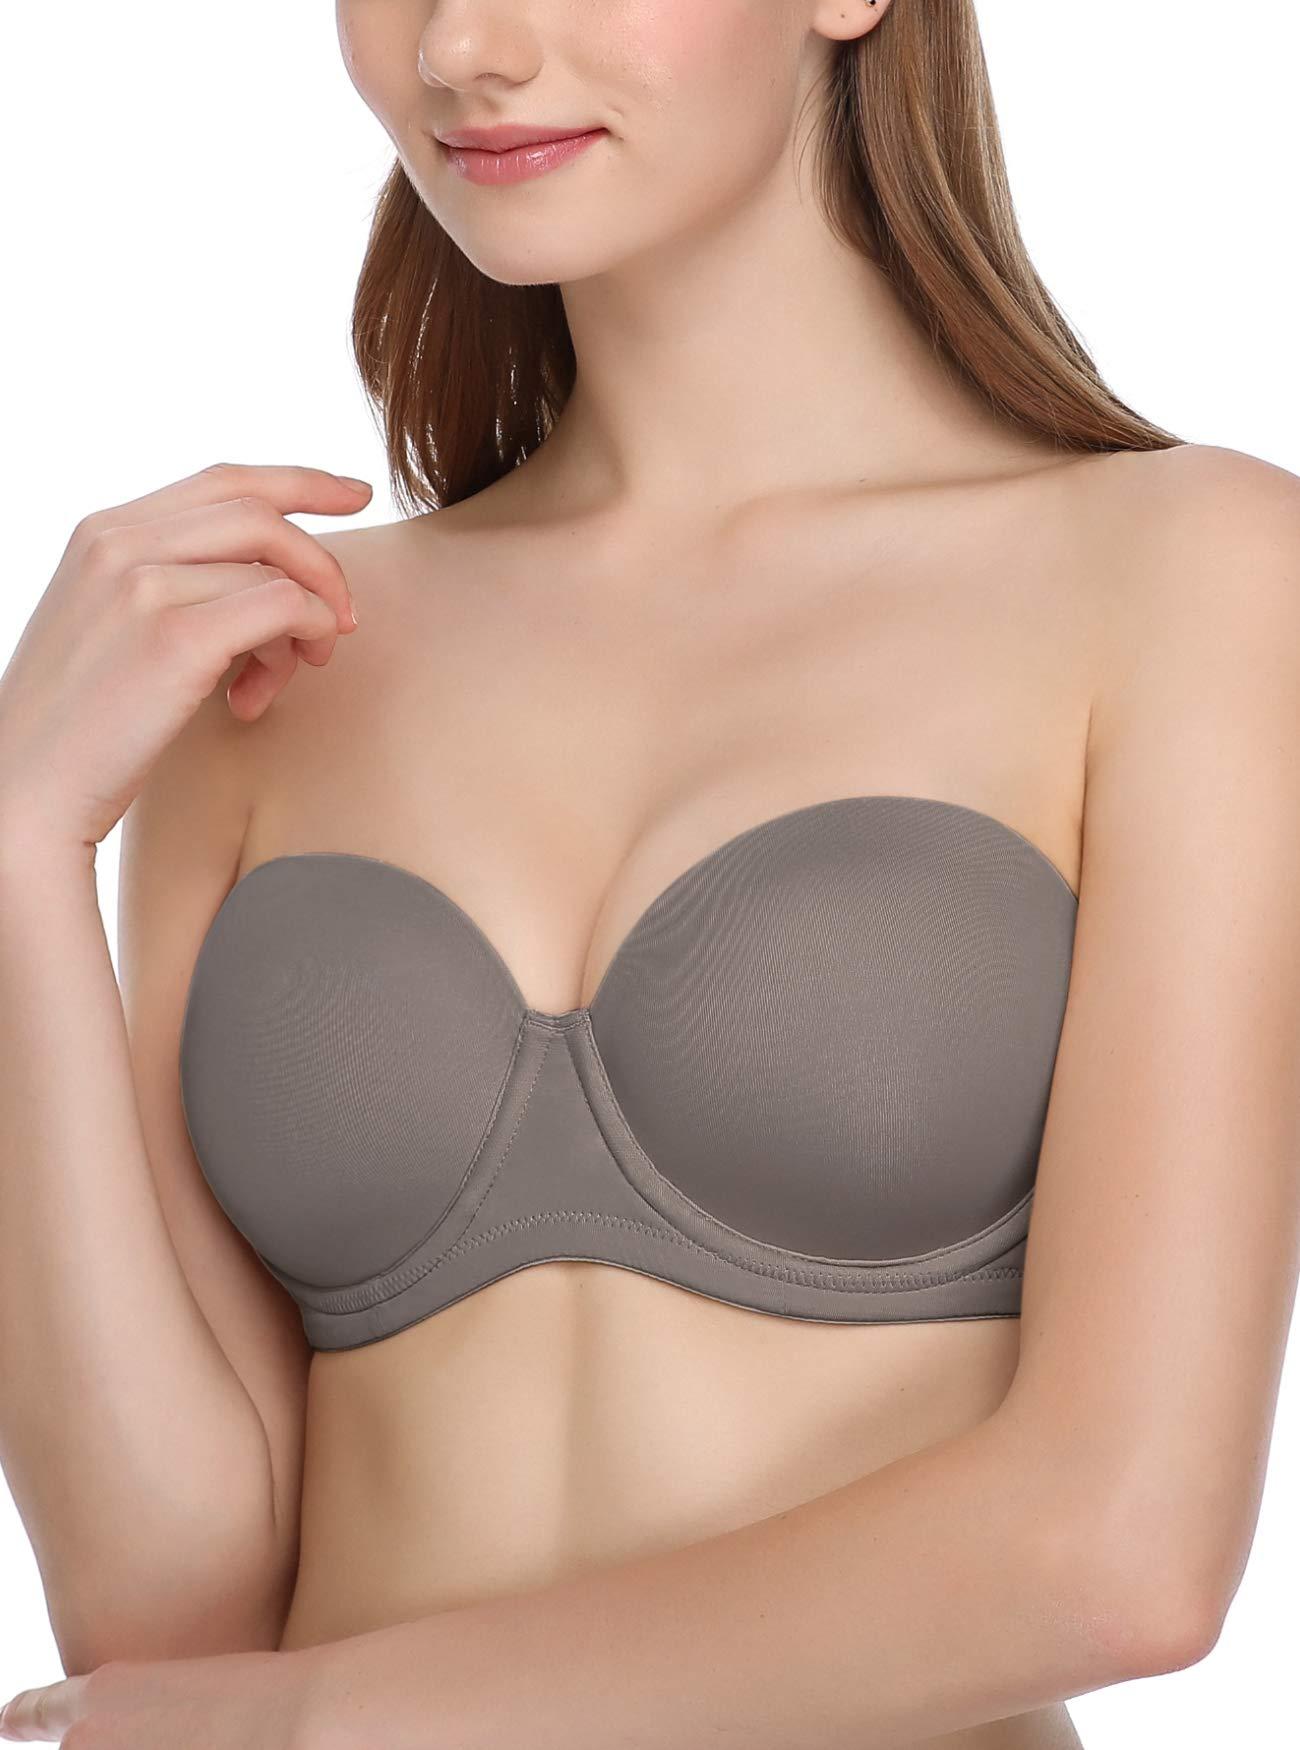 JOATEAY Women's Strapless Bra Full Figure Multiway Red Carpet Underwrie Bra Stay Put Plus Size